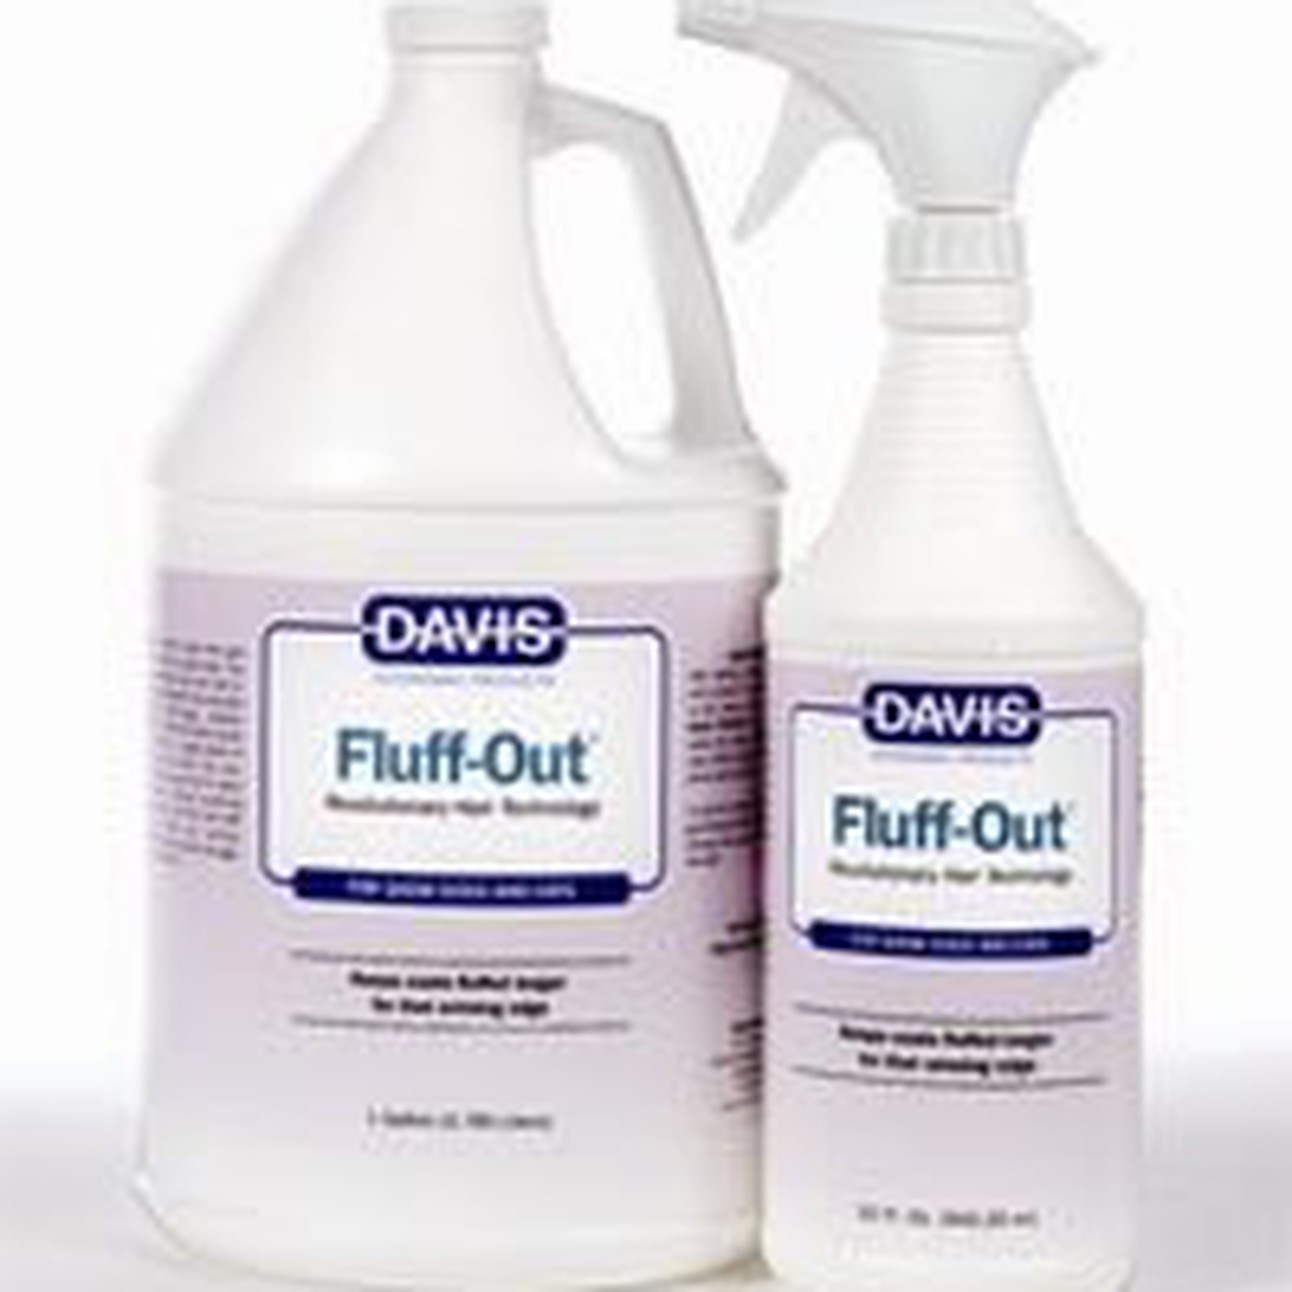 Davis Fluff Out Spray